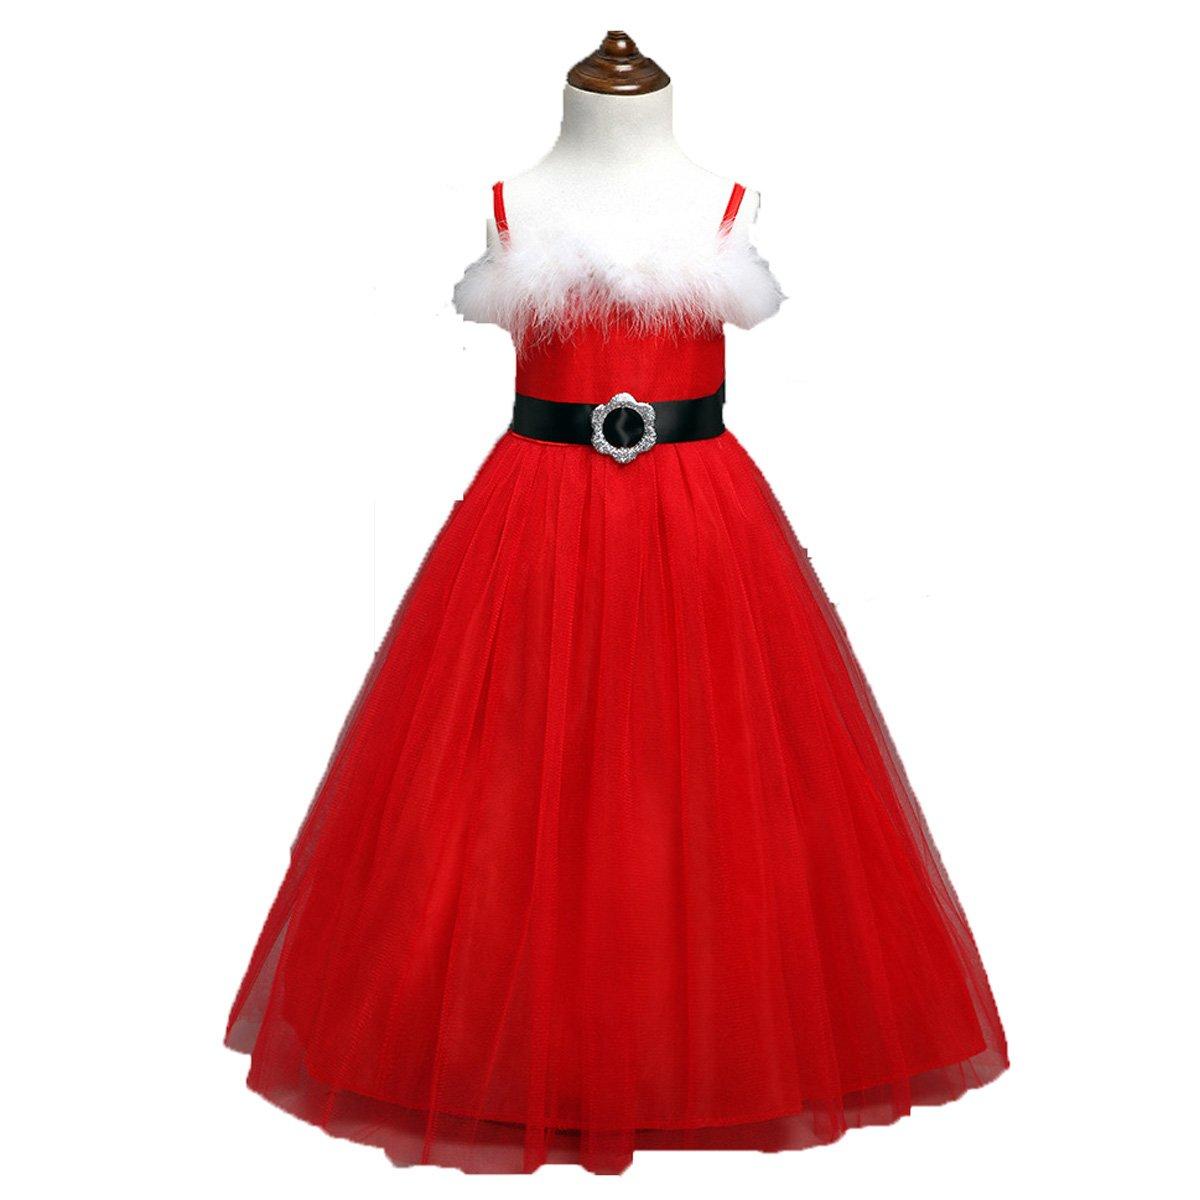 797f1310b1c ... Baby Girls Christmas Costume Xmas Santa Claus Party Wedding Detail  Feedback Questions About Christmas Newborn Kids Baby Girls Xmas Romper  Jumpsuit ...